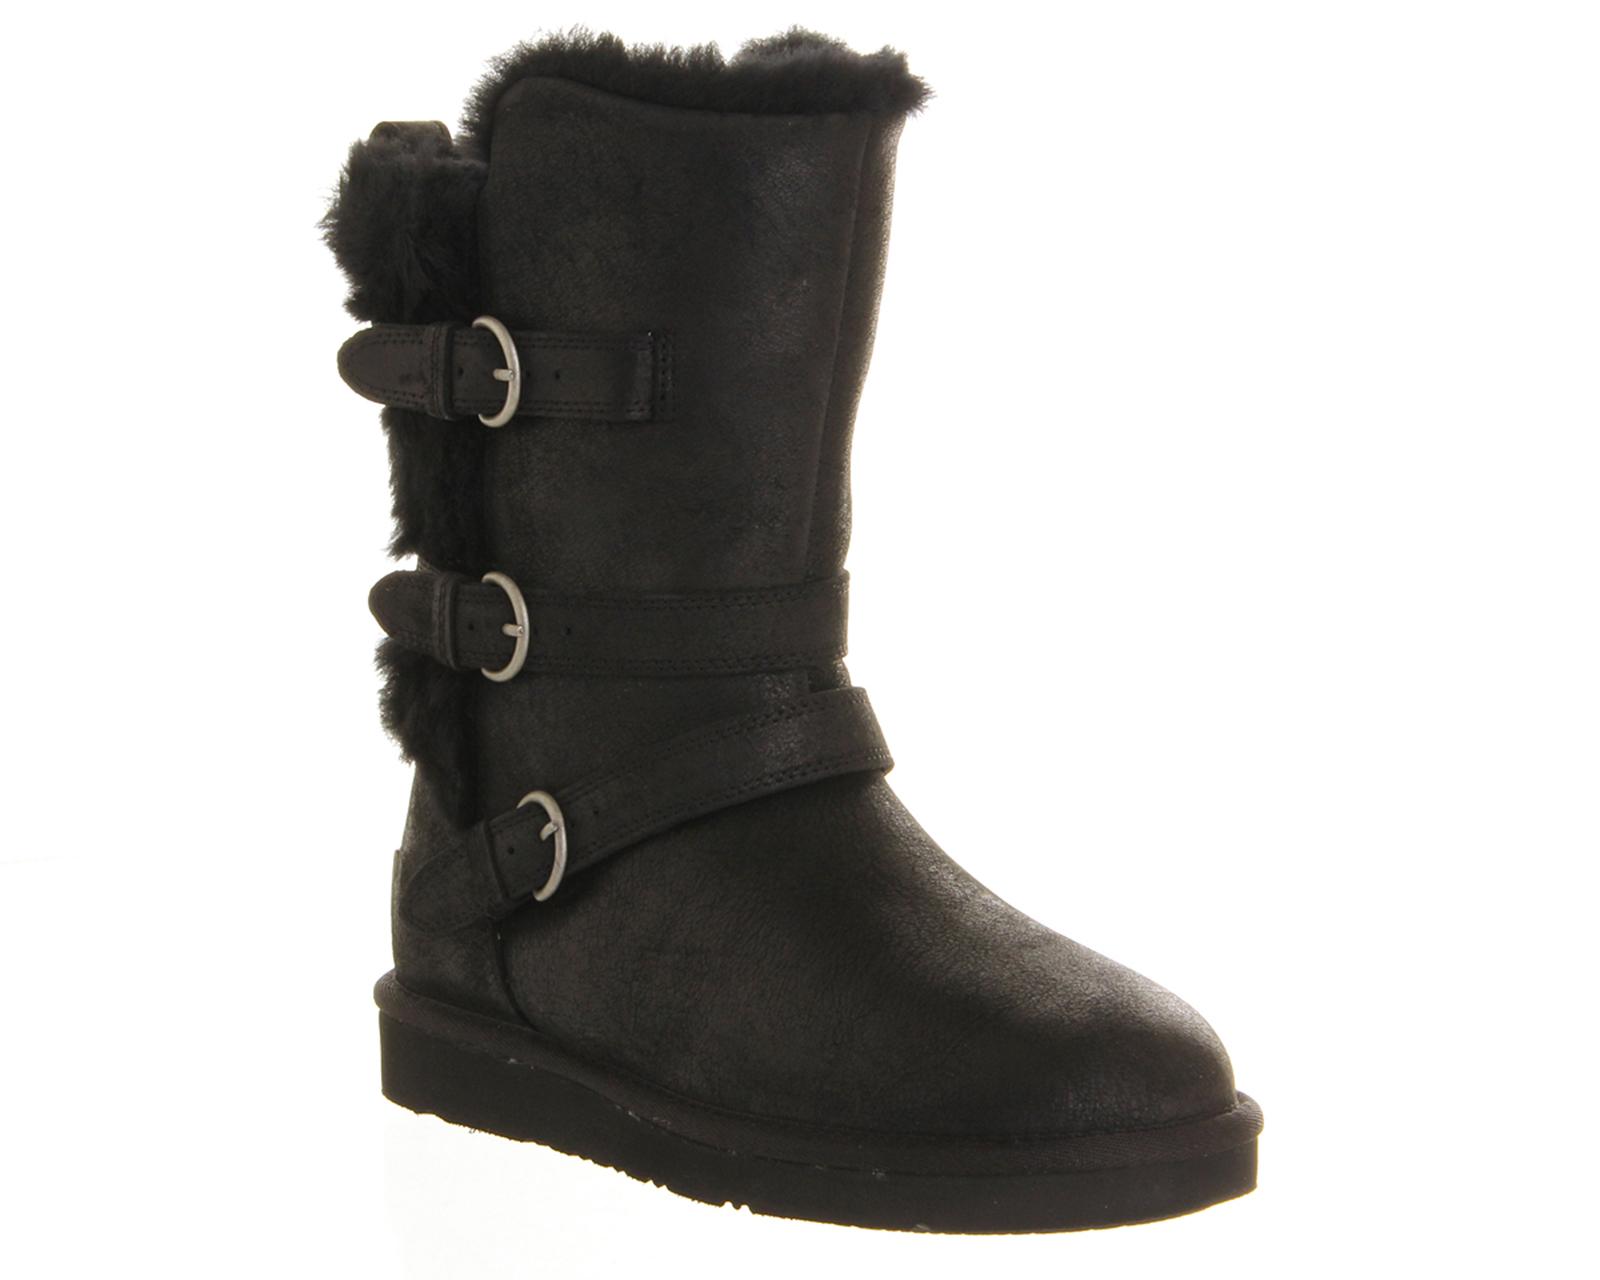 Ugg Boots sale, ugg boots, cheap ugg boots, shoe sales, designer shoe sale, january sales, latest sales